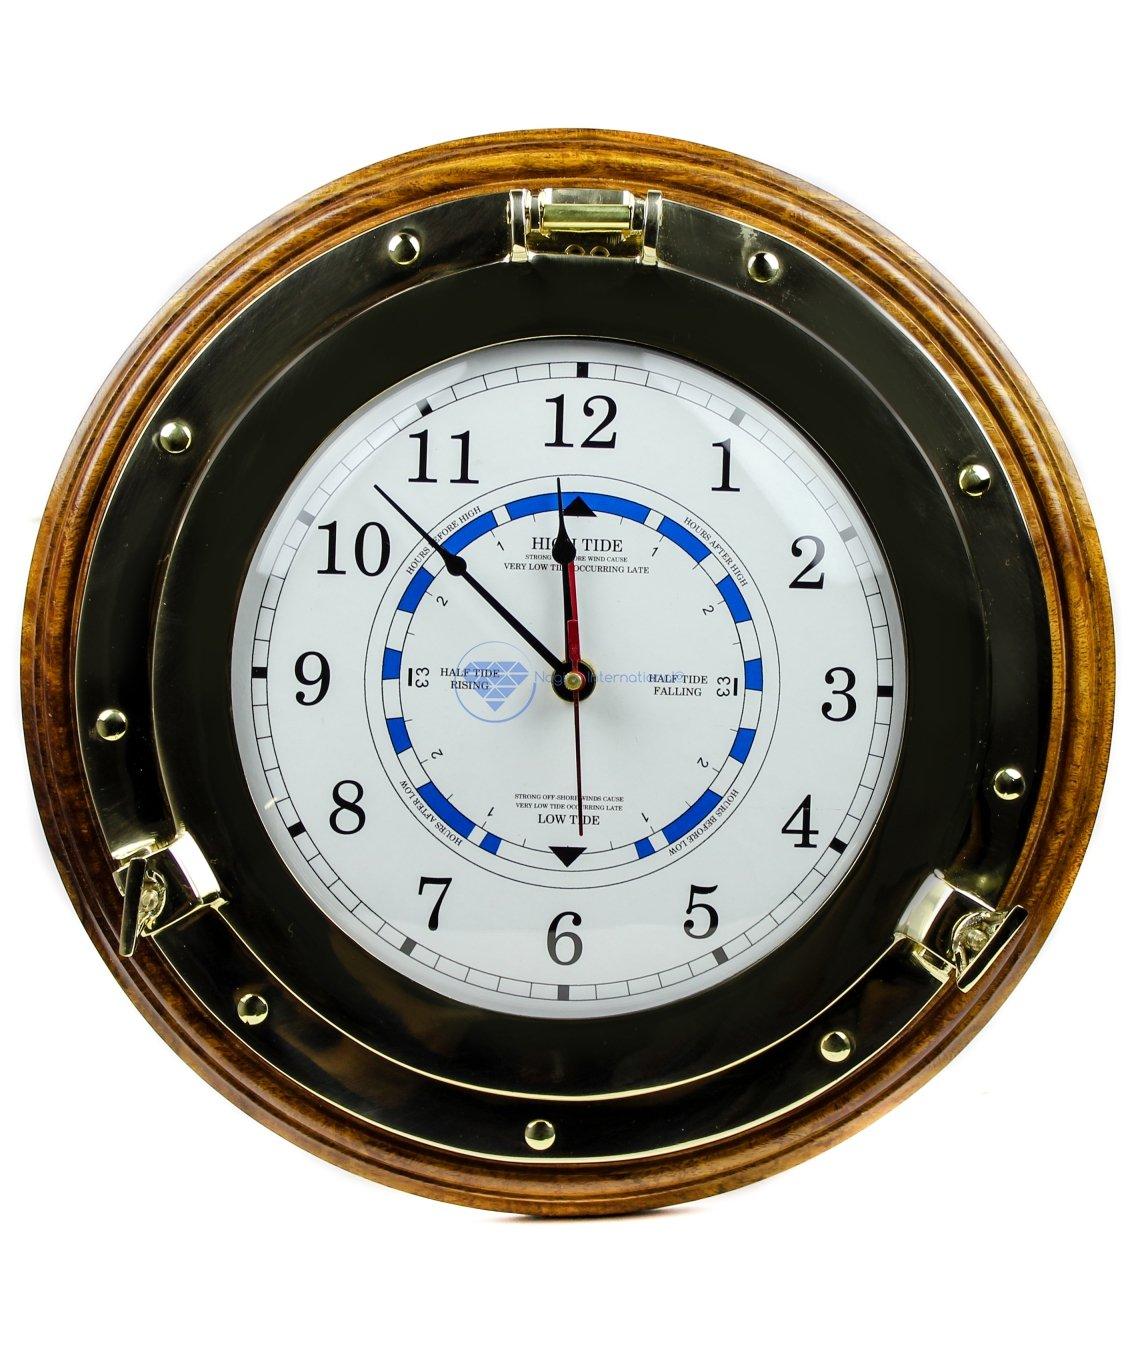 Beautiful Navy Style Time Tide Clock | Nautical Brass Decor Gift | Nagina International (14 Inches) by Nagina International